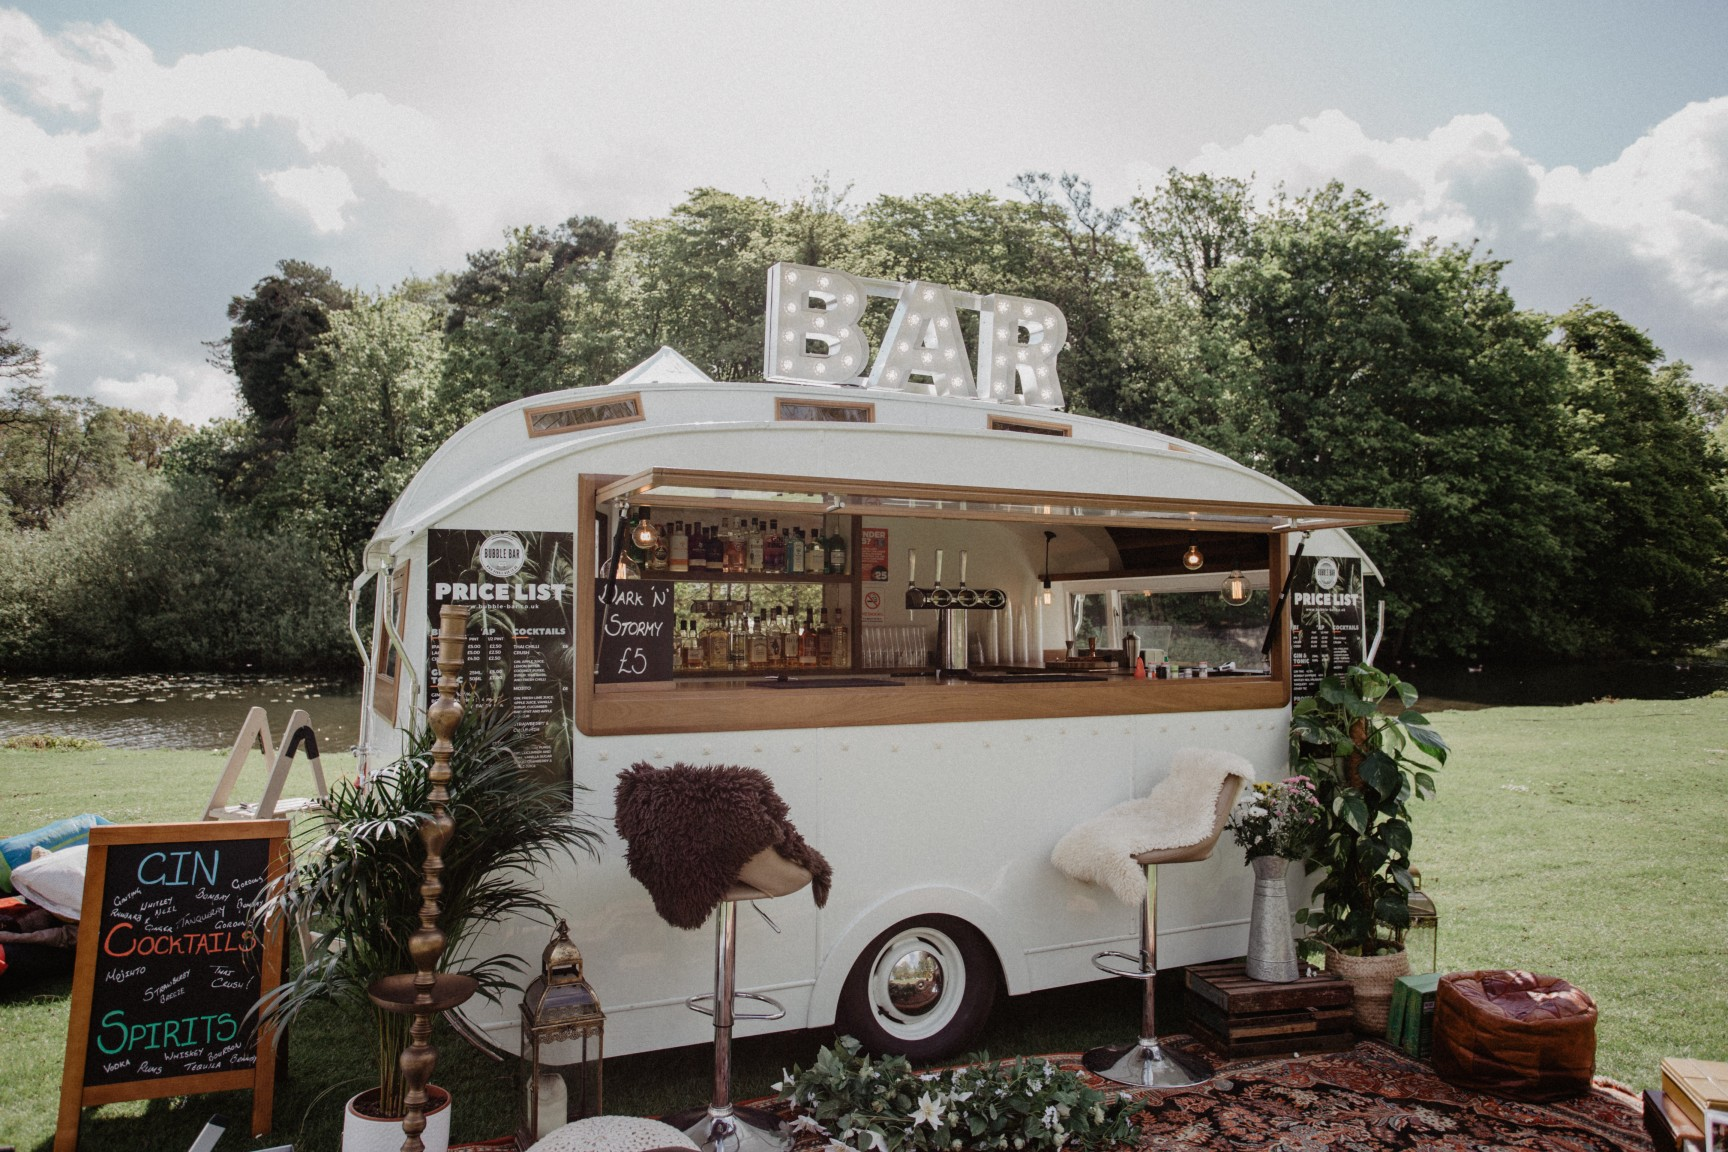 Festival wedding - Unconventional Wedding Festival - The Bubble Bar - Nicki Shea Photography - alternative wedding (2)